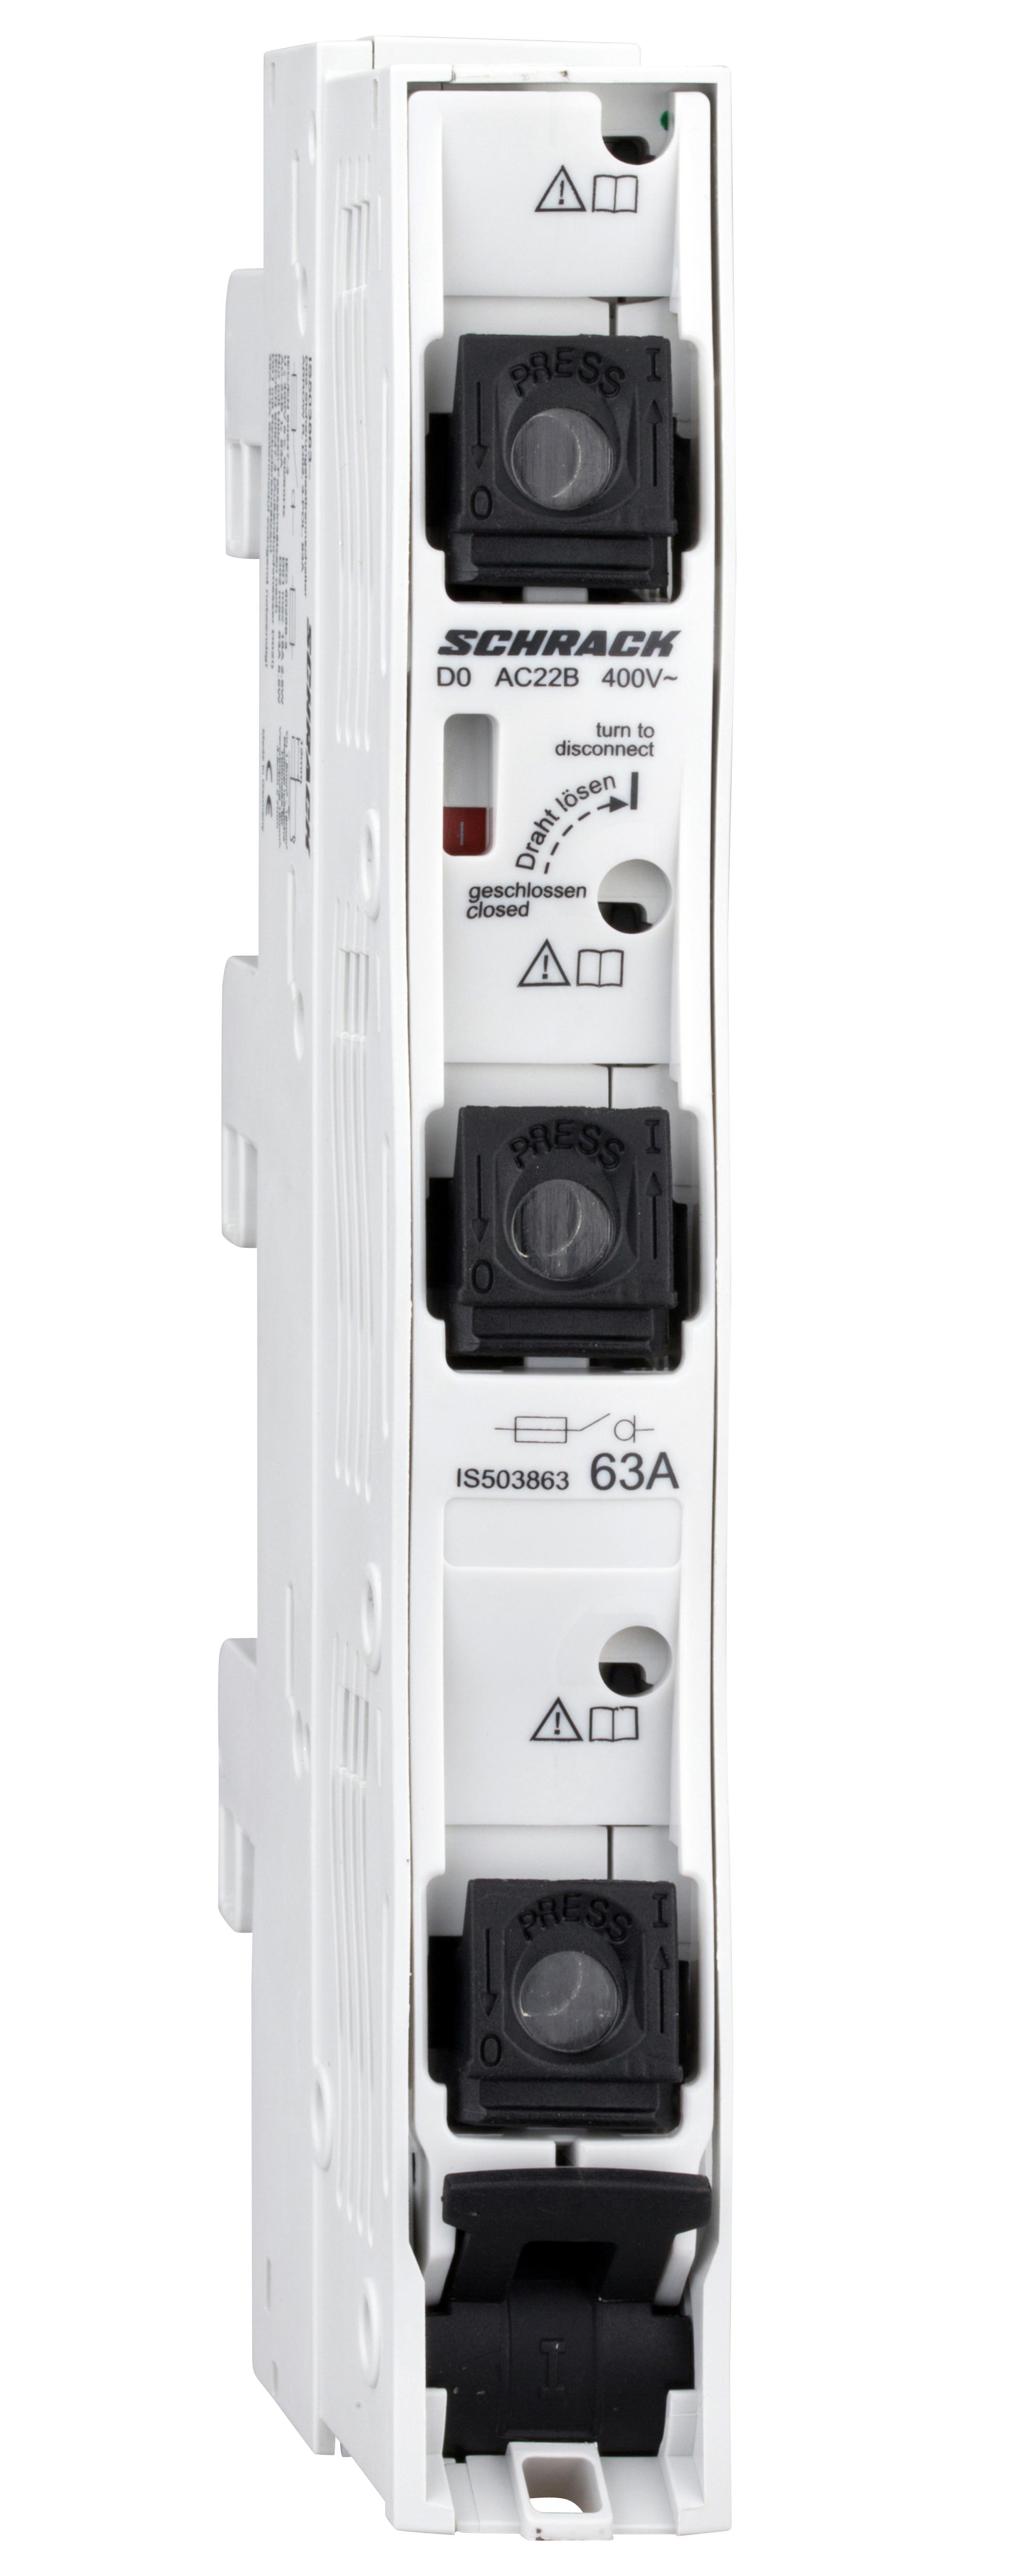 1 Stk D02-Sicherungslasttrennleiste ARROW R, 3-polig, 63A IS503863--